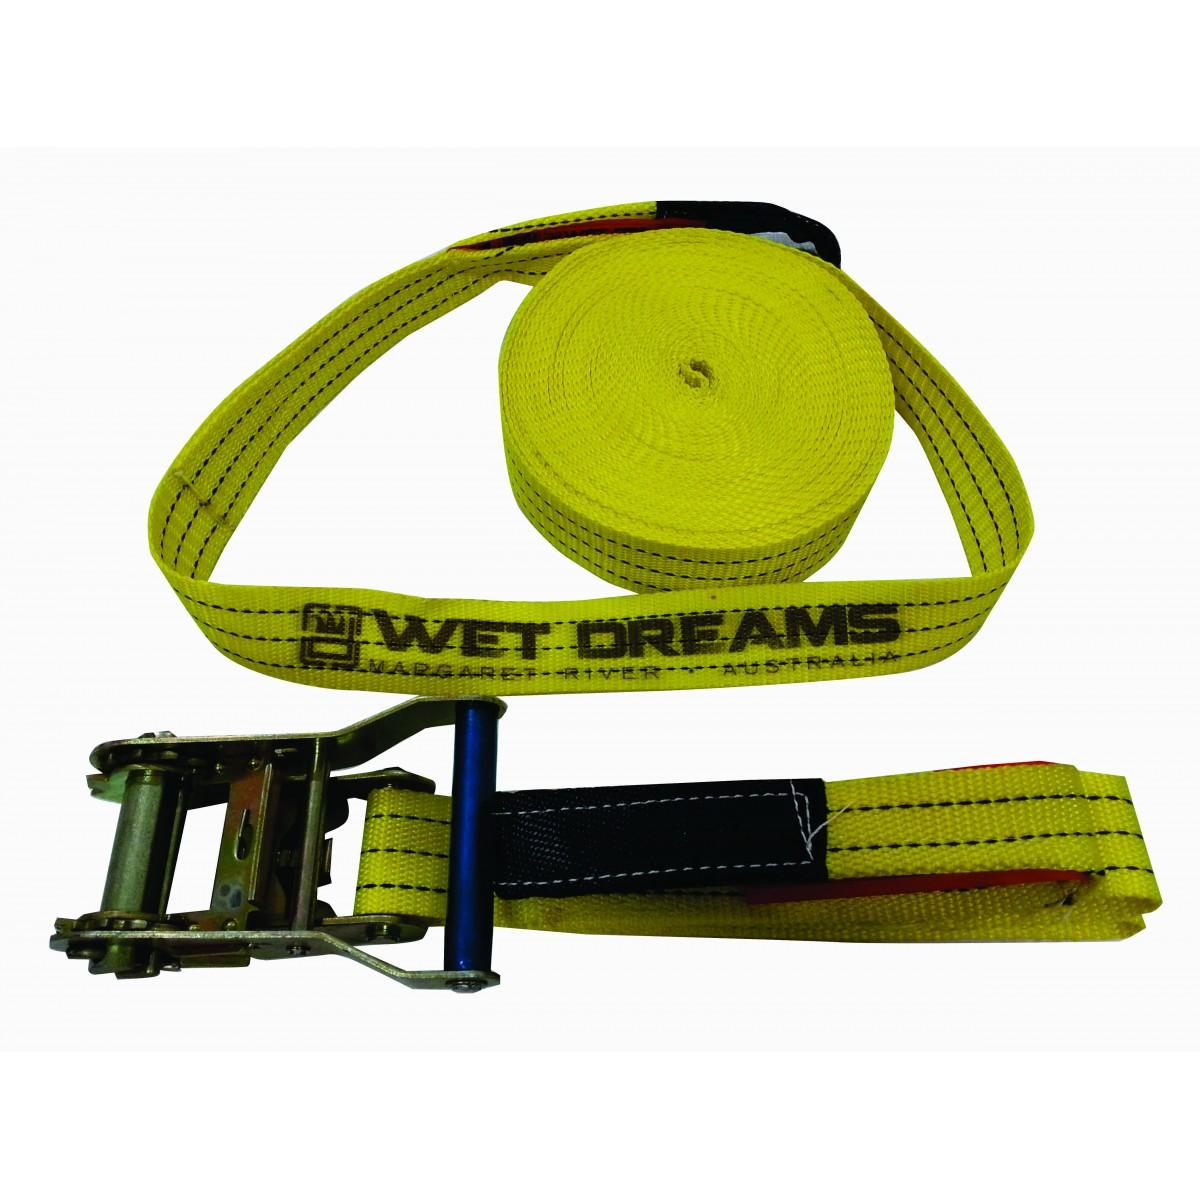 Kit Slackline Cinta 15 Metros X 50mm  - Wet Dreams